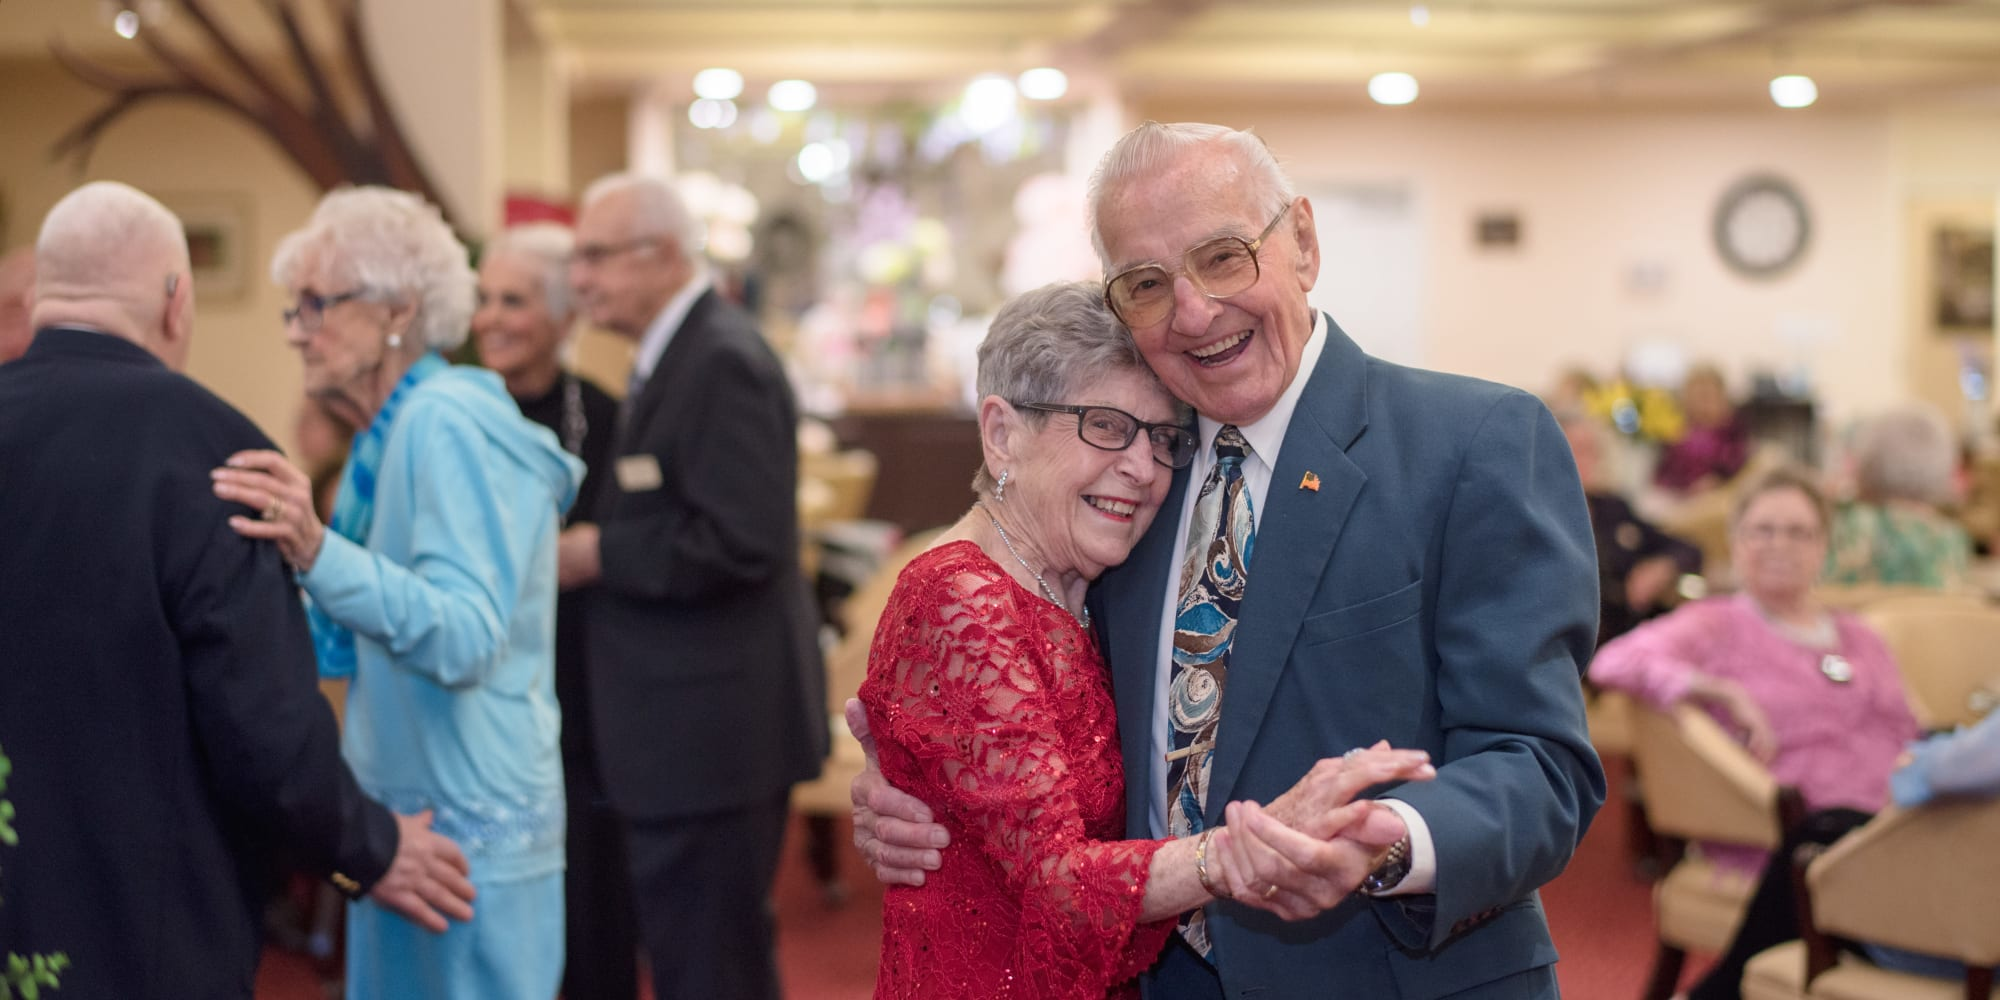 Residents enjoying a dance at Maple Ridge Gracious Retirement Living in Cedar Park, Texas